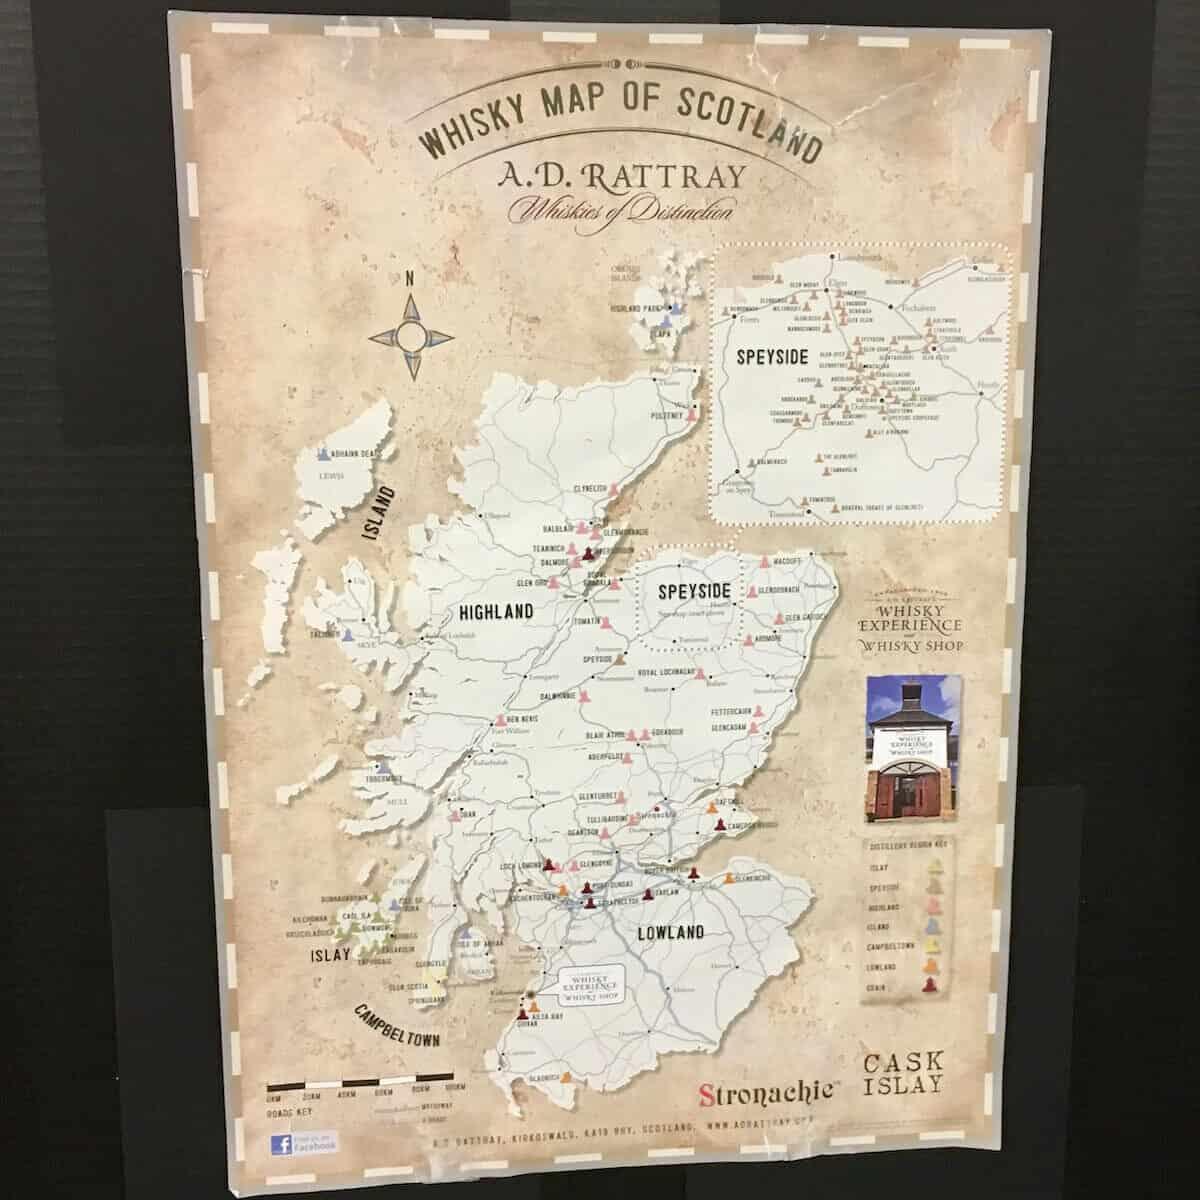 Map of Scotland's scotch regions.